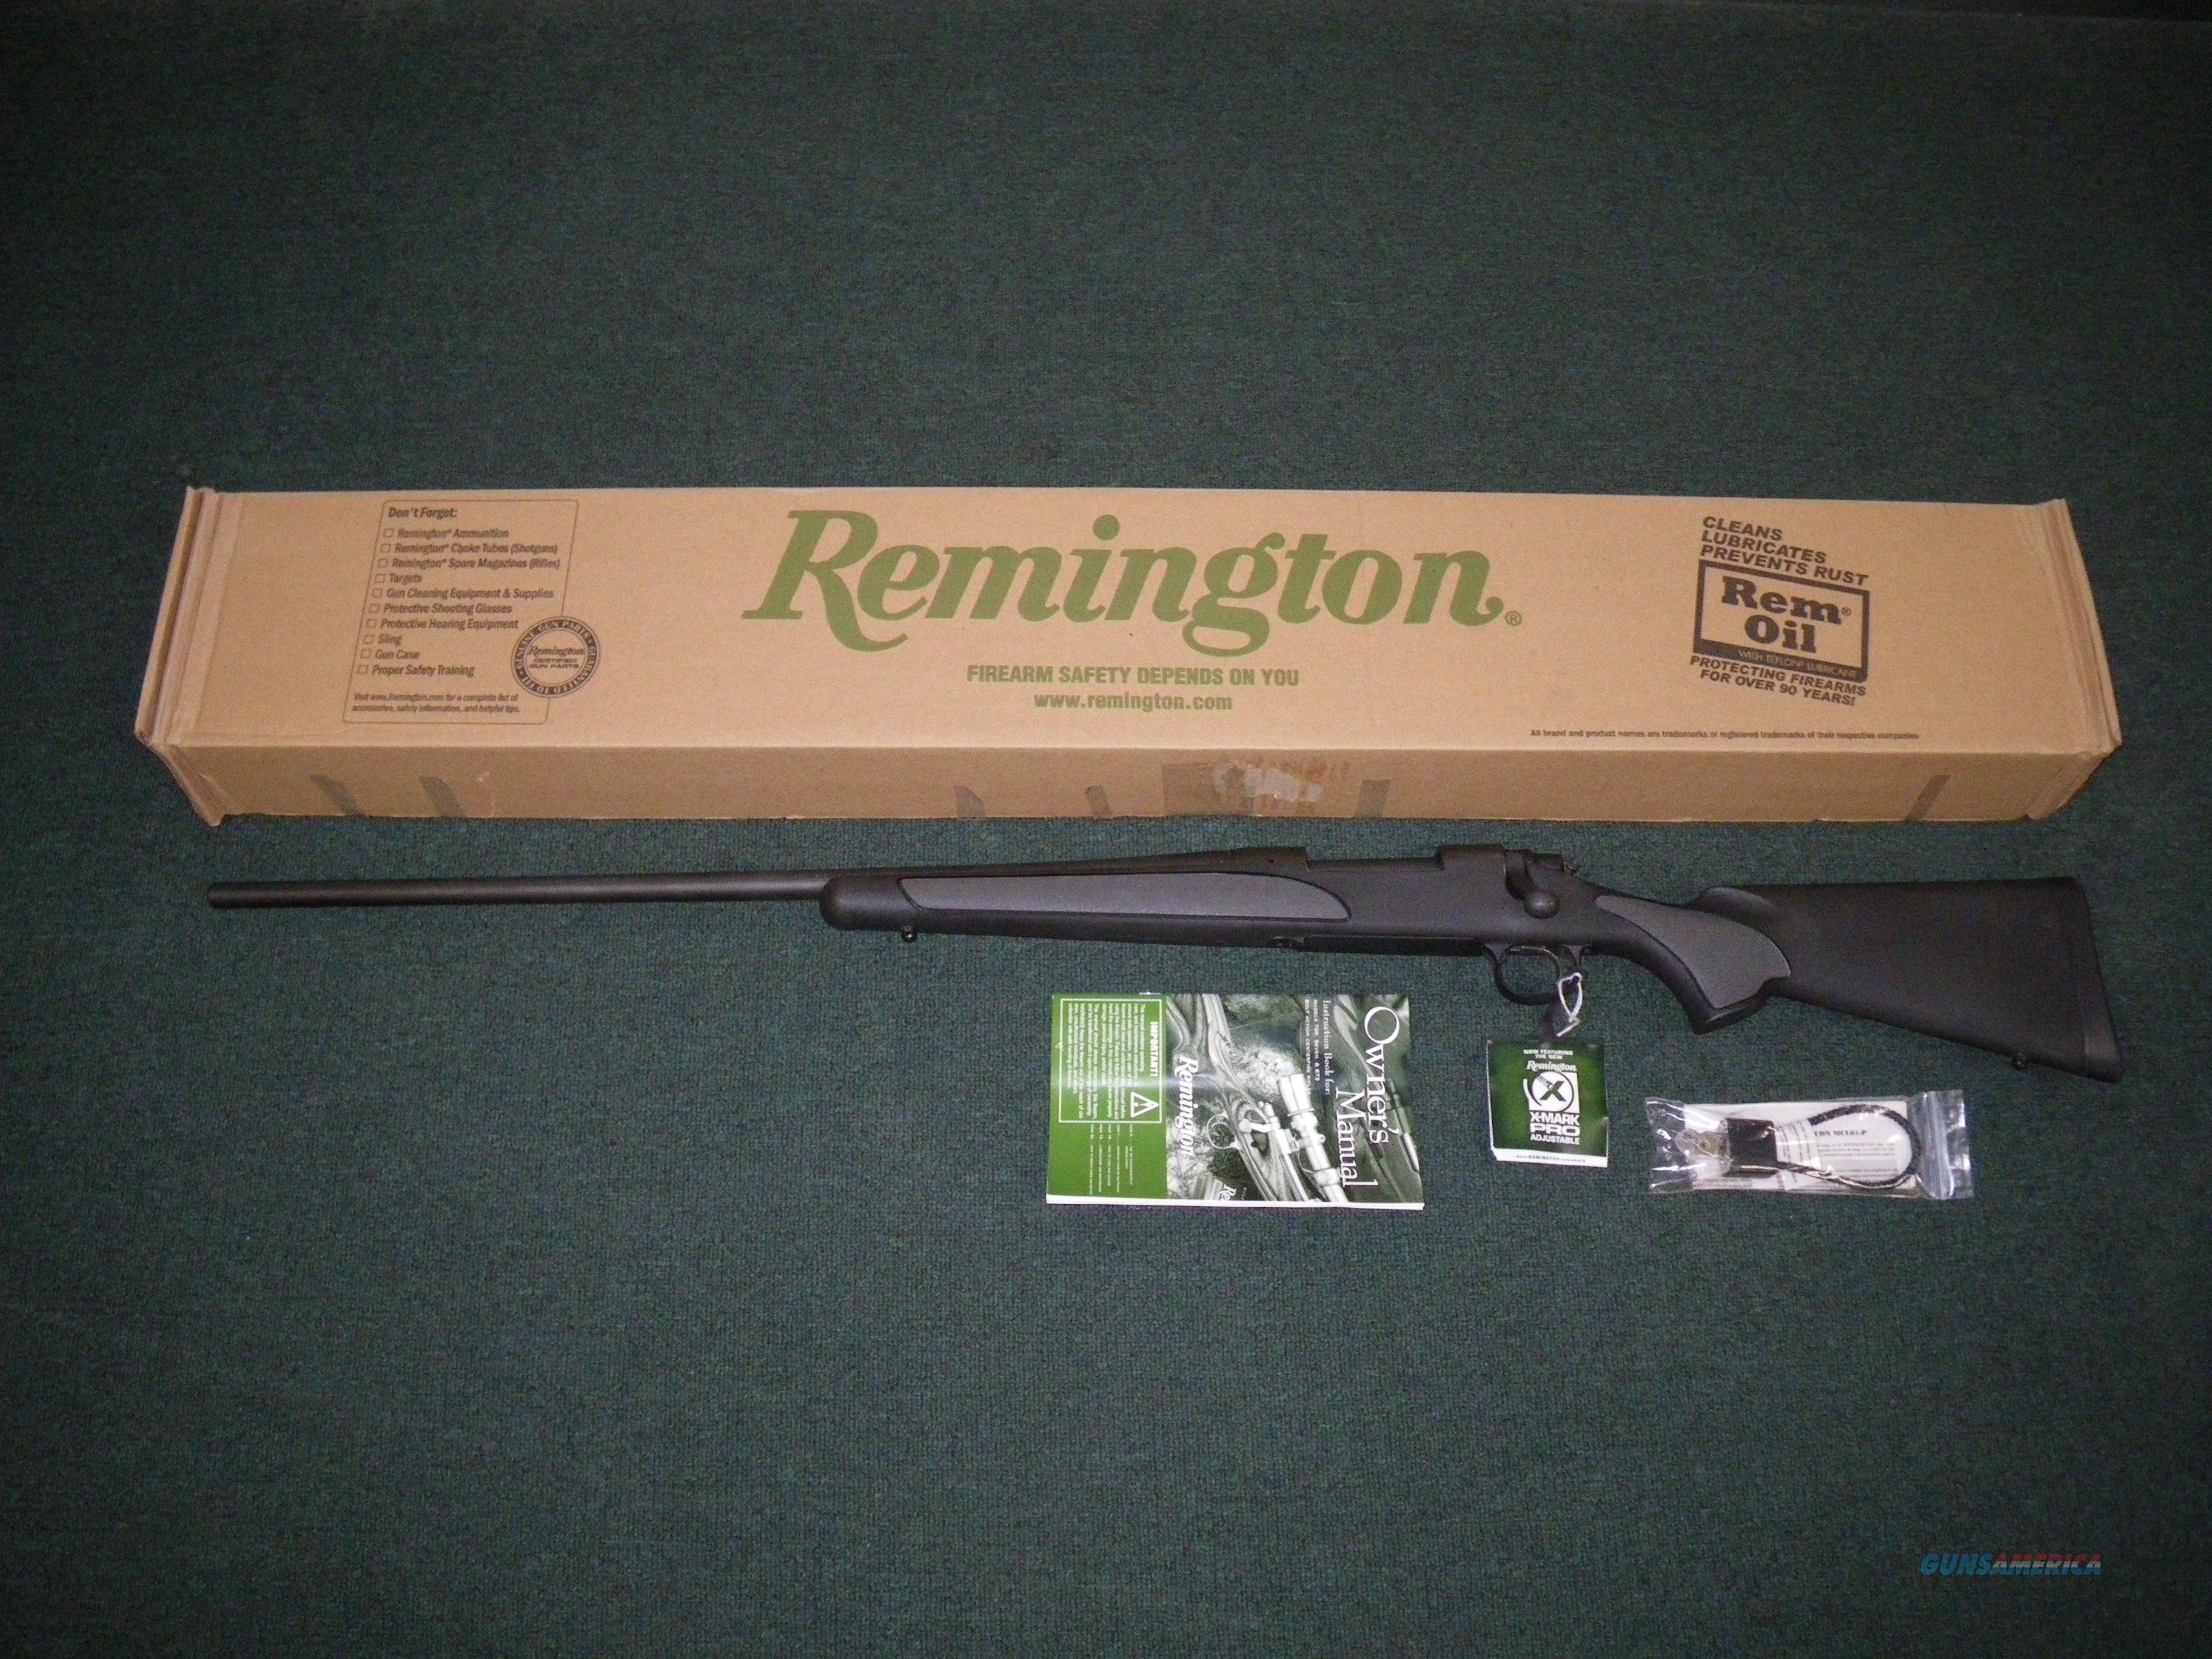 "Remington Model 700 SPS LH 30-06 Spfld 24"" NEW #84178  Guns > Rifles > Remington Rifles - Modern > Model 700 > Sporting"